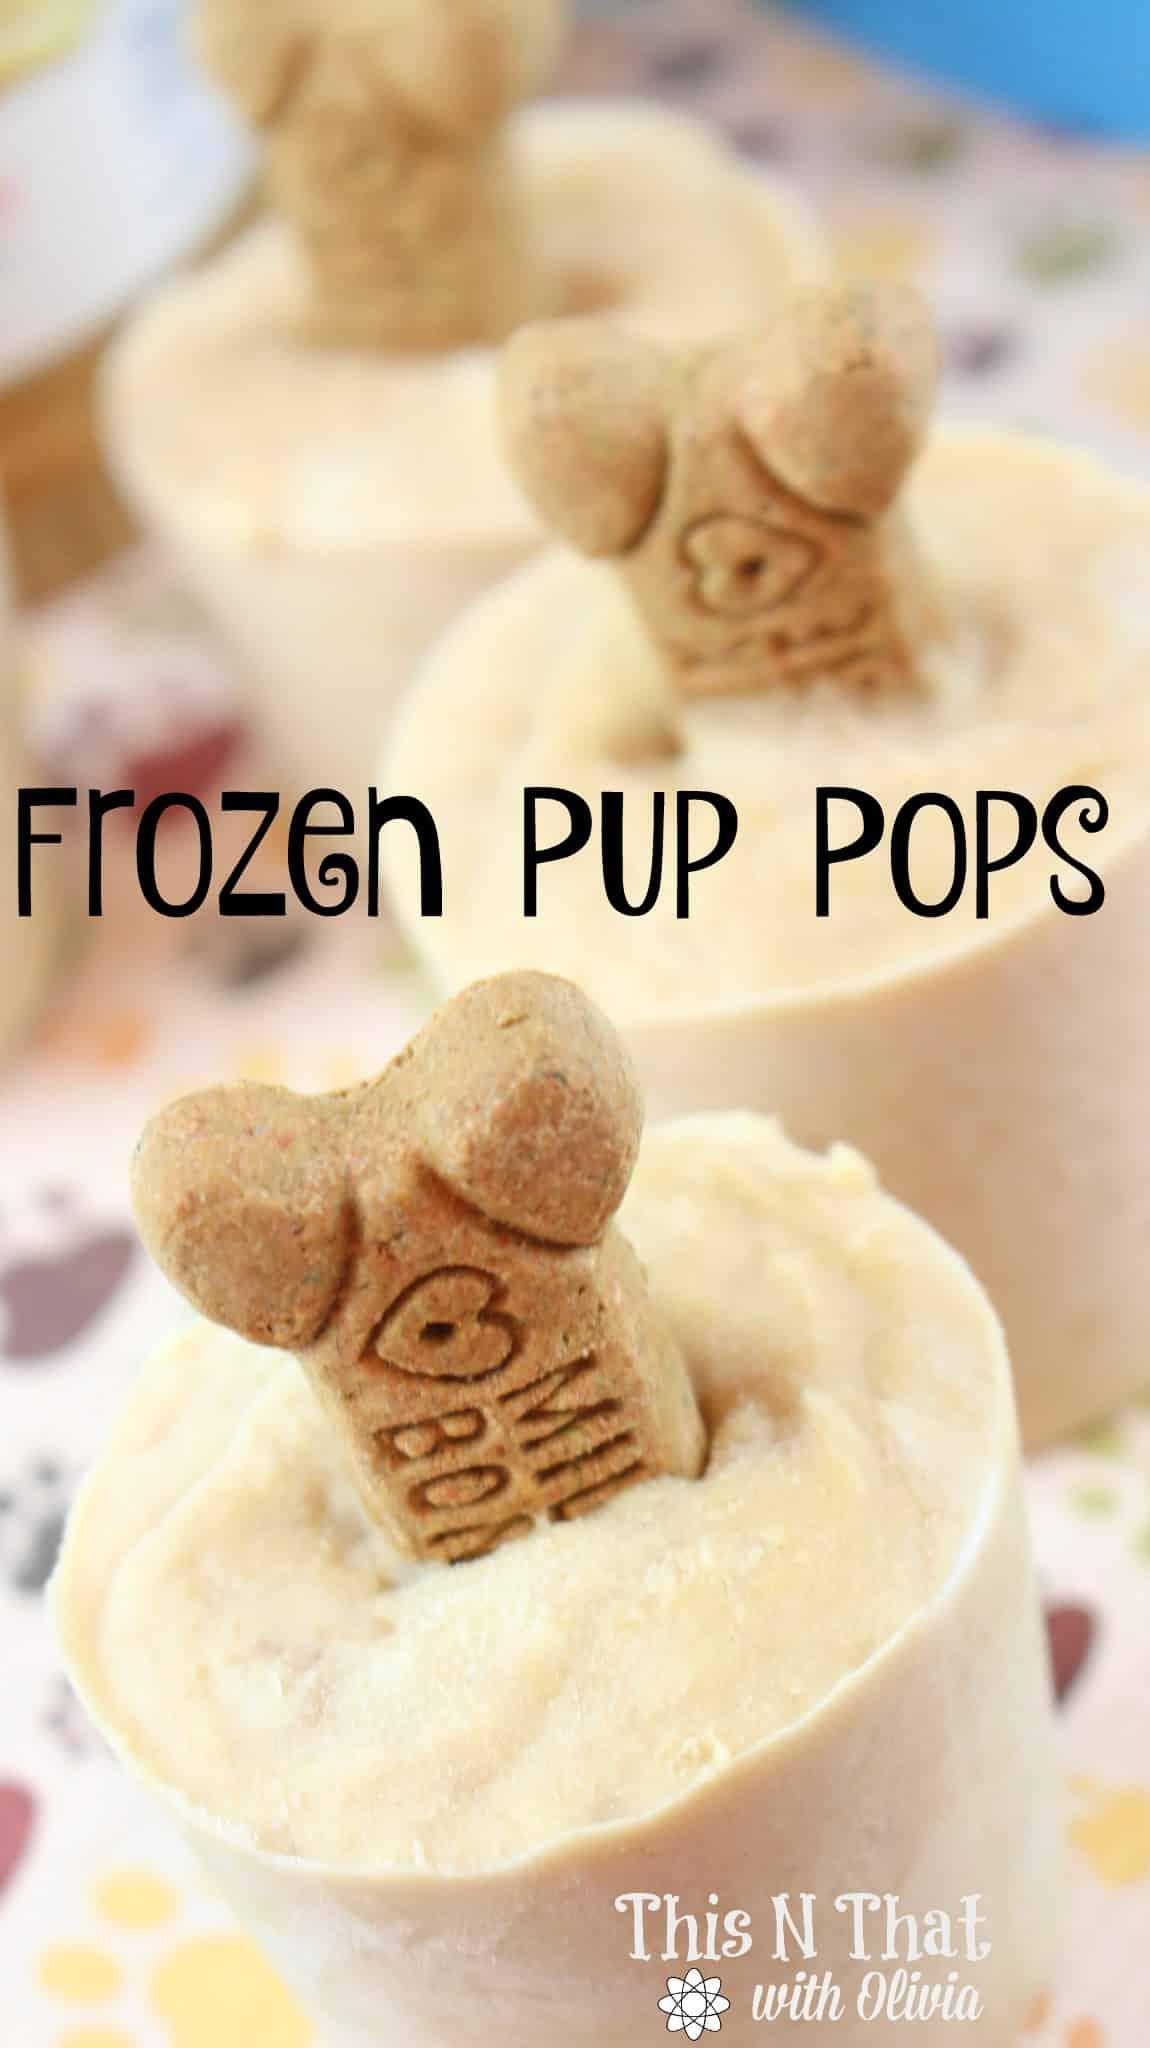 Frozen Pup Pops for your Furry Friends! #Pup #Frozen #Treat #Dog